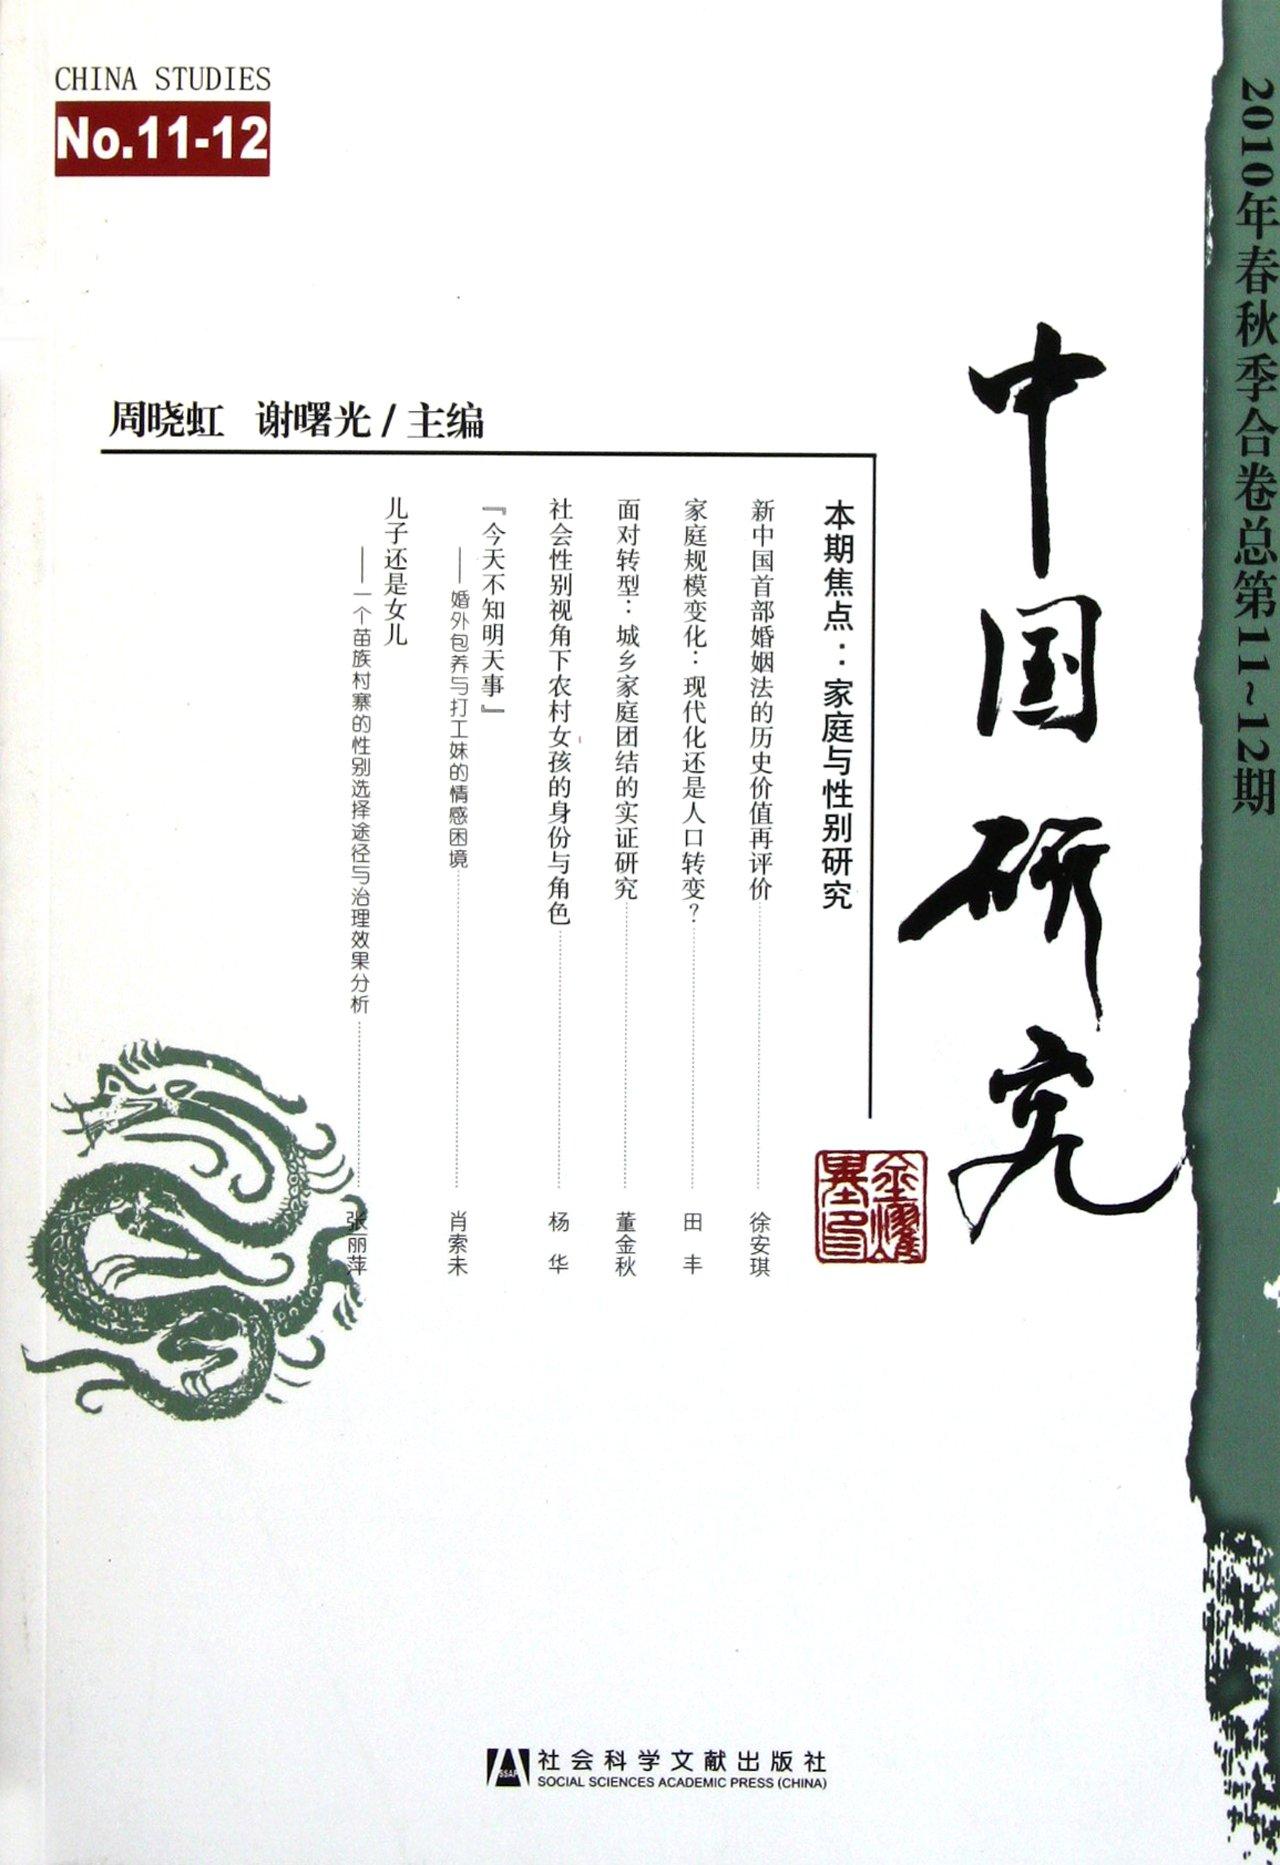 China Studies(Vol.11-12) (Chinese Edition) ebook